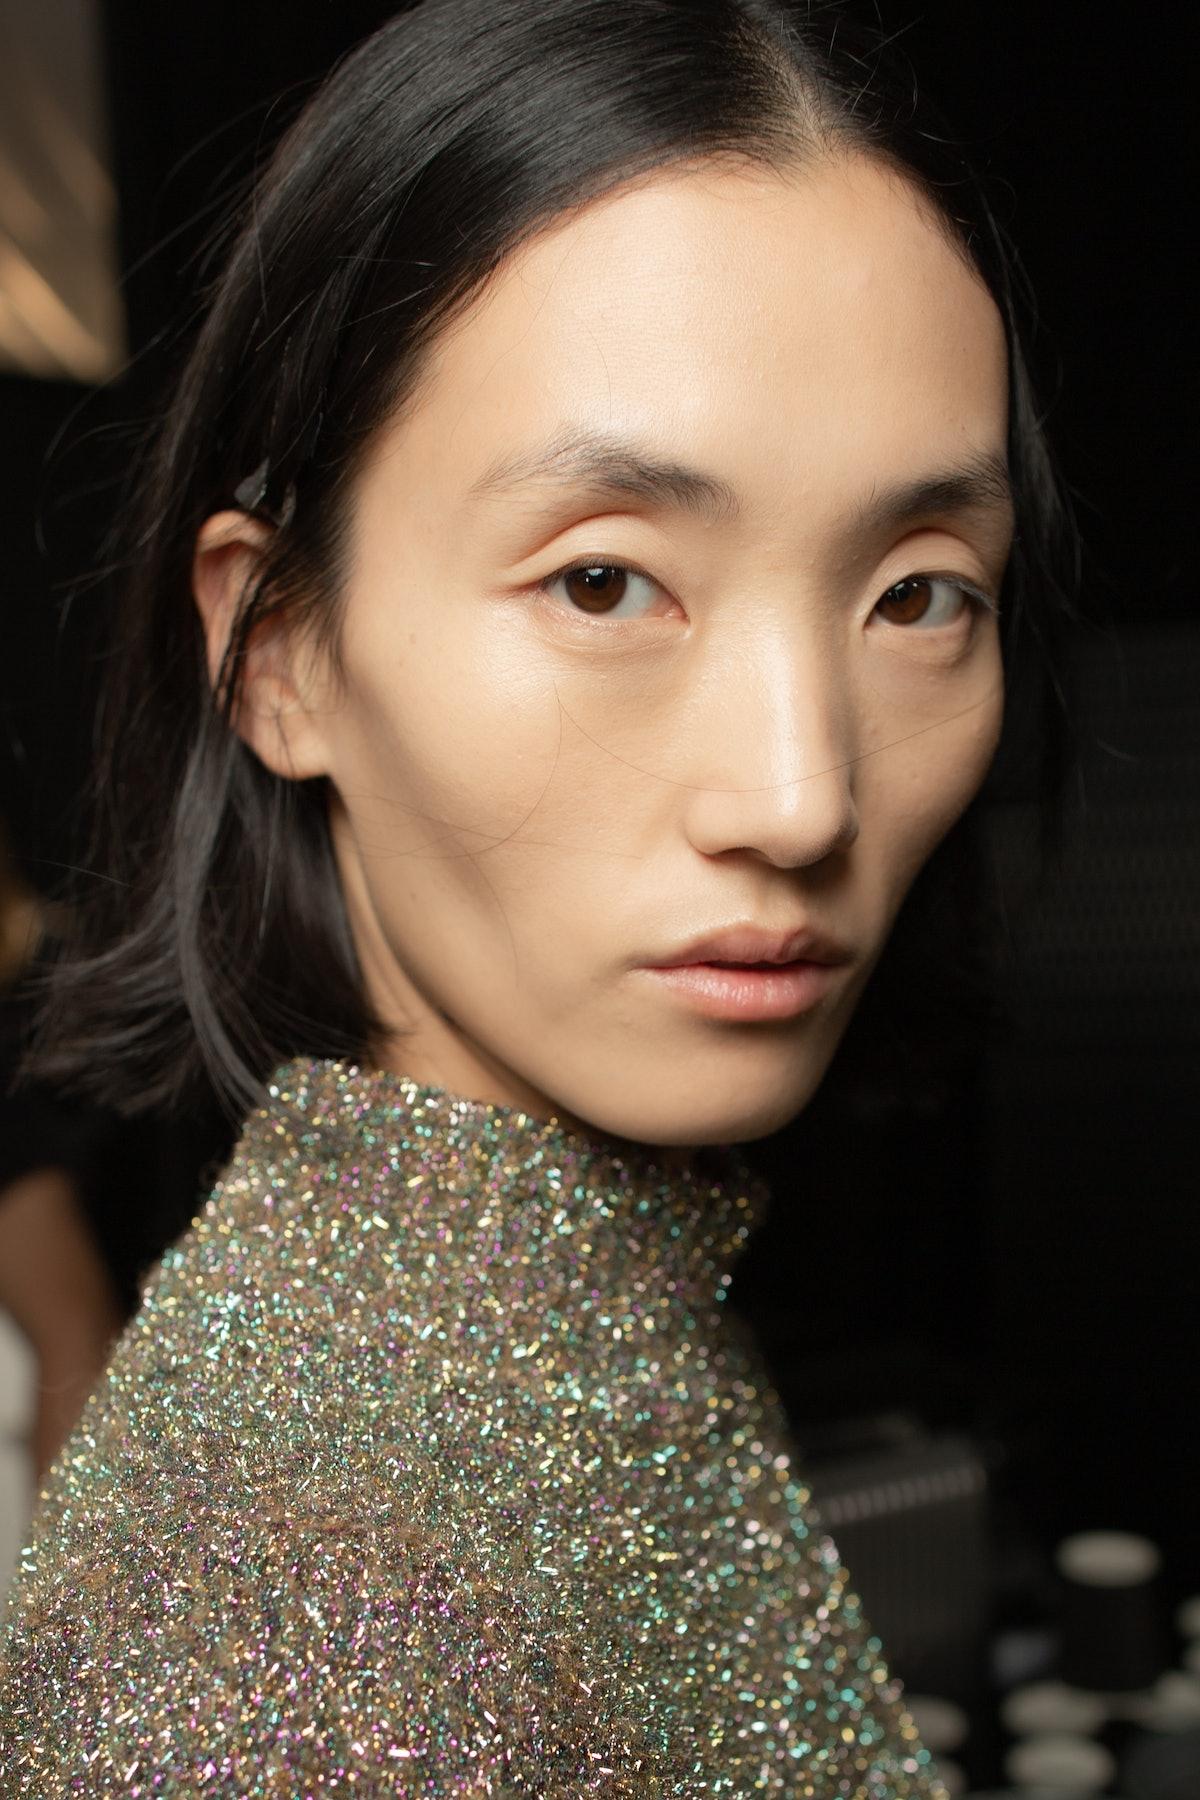 Serichai_Givenchy-010.jpg